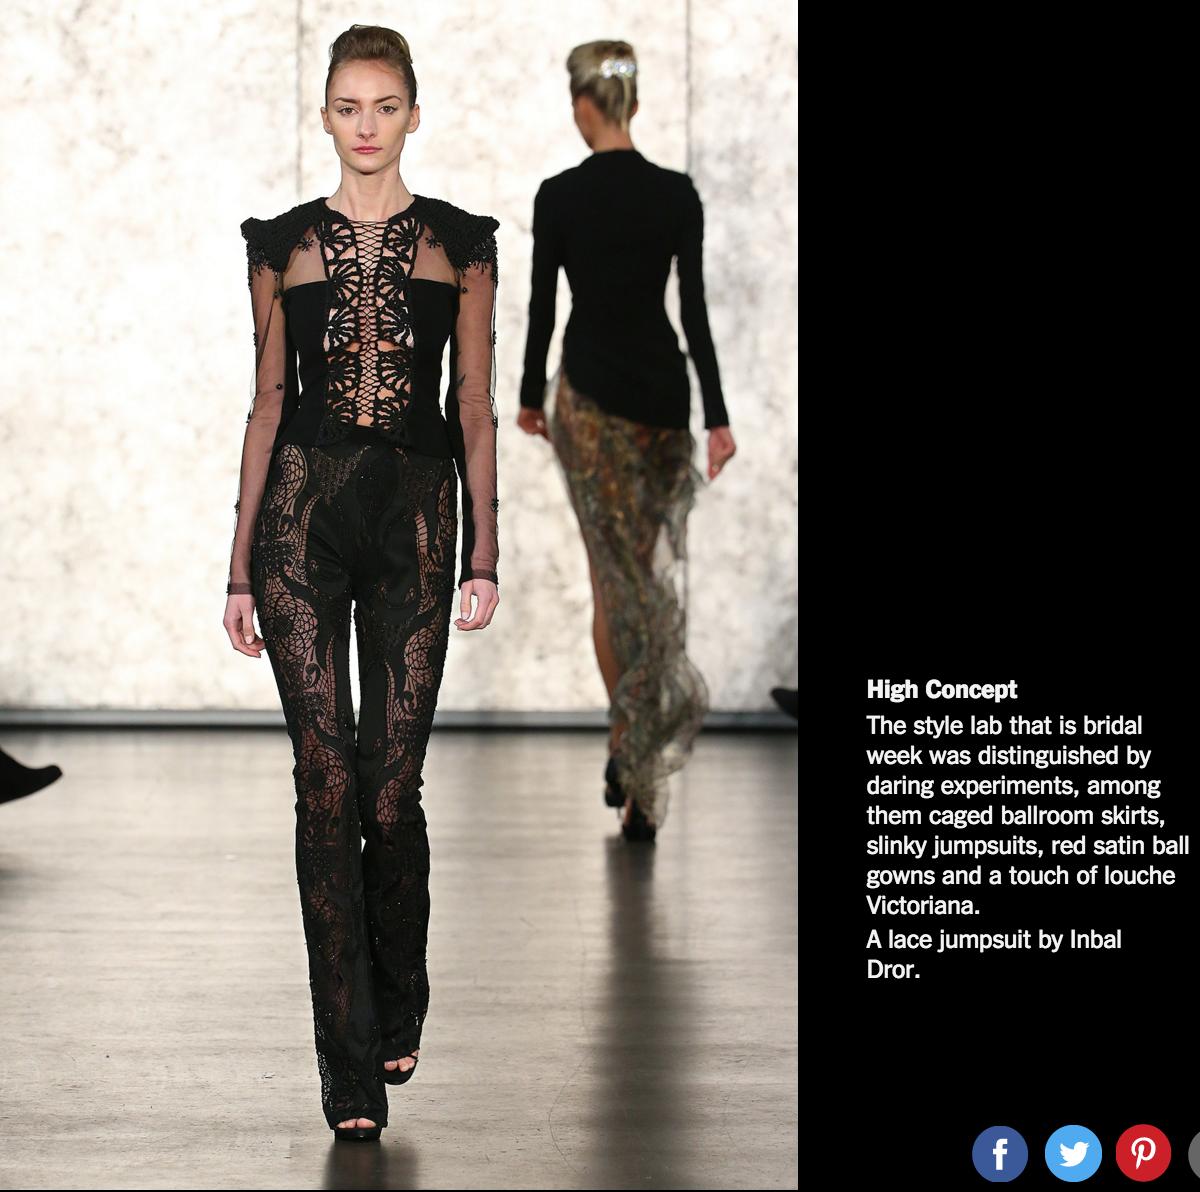 Pin by Nicole Fish on fashion Fashion, Leather pants, Pants